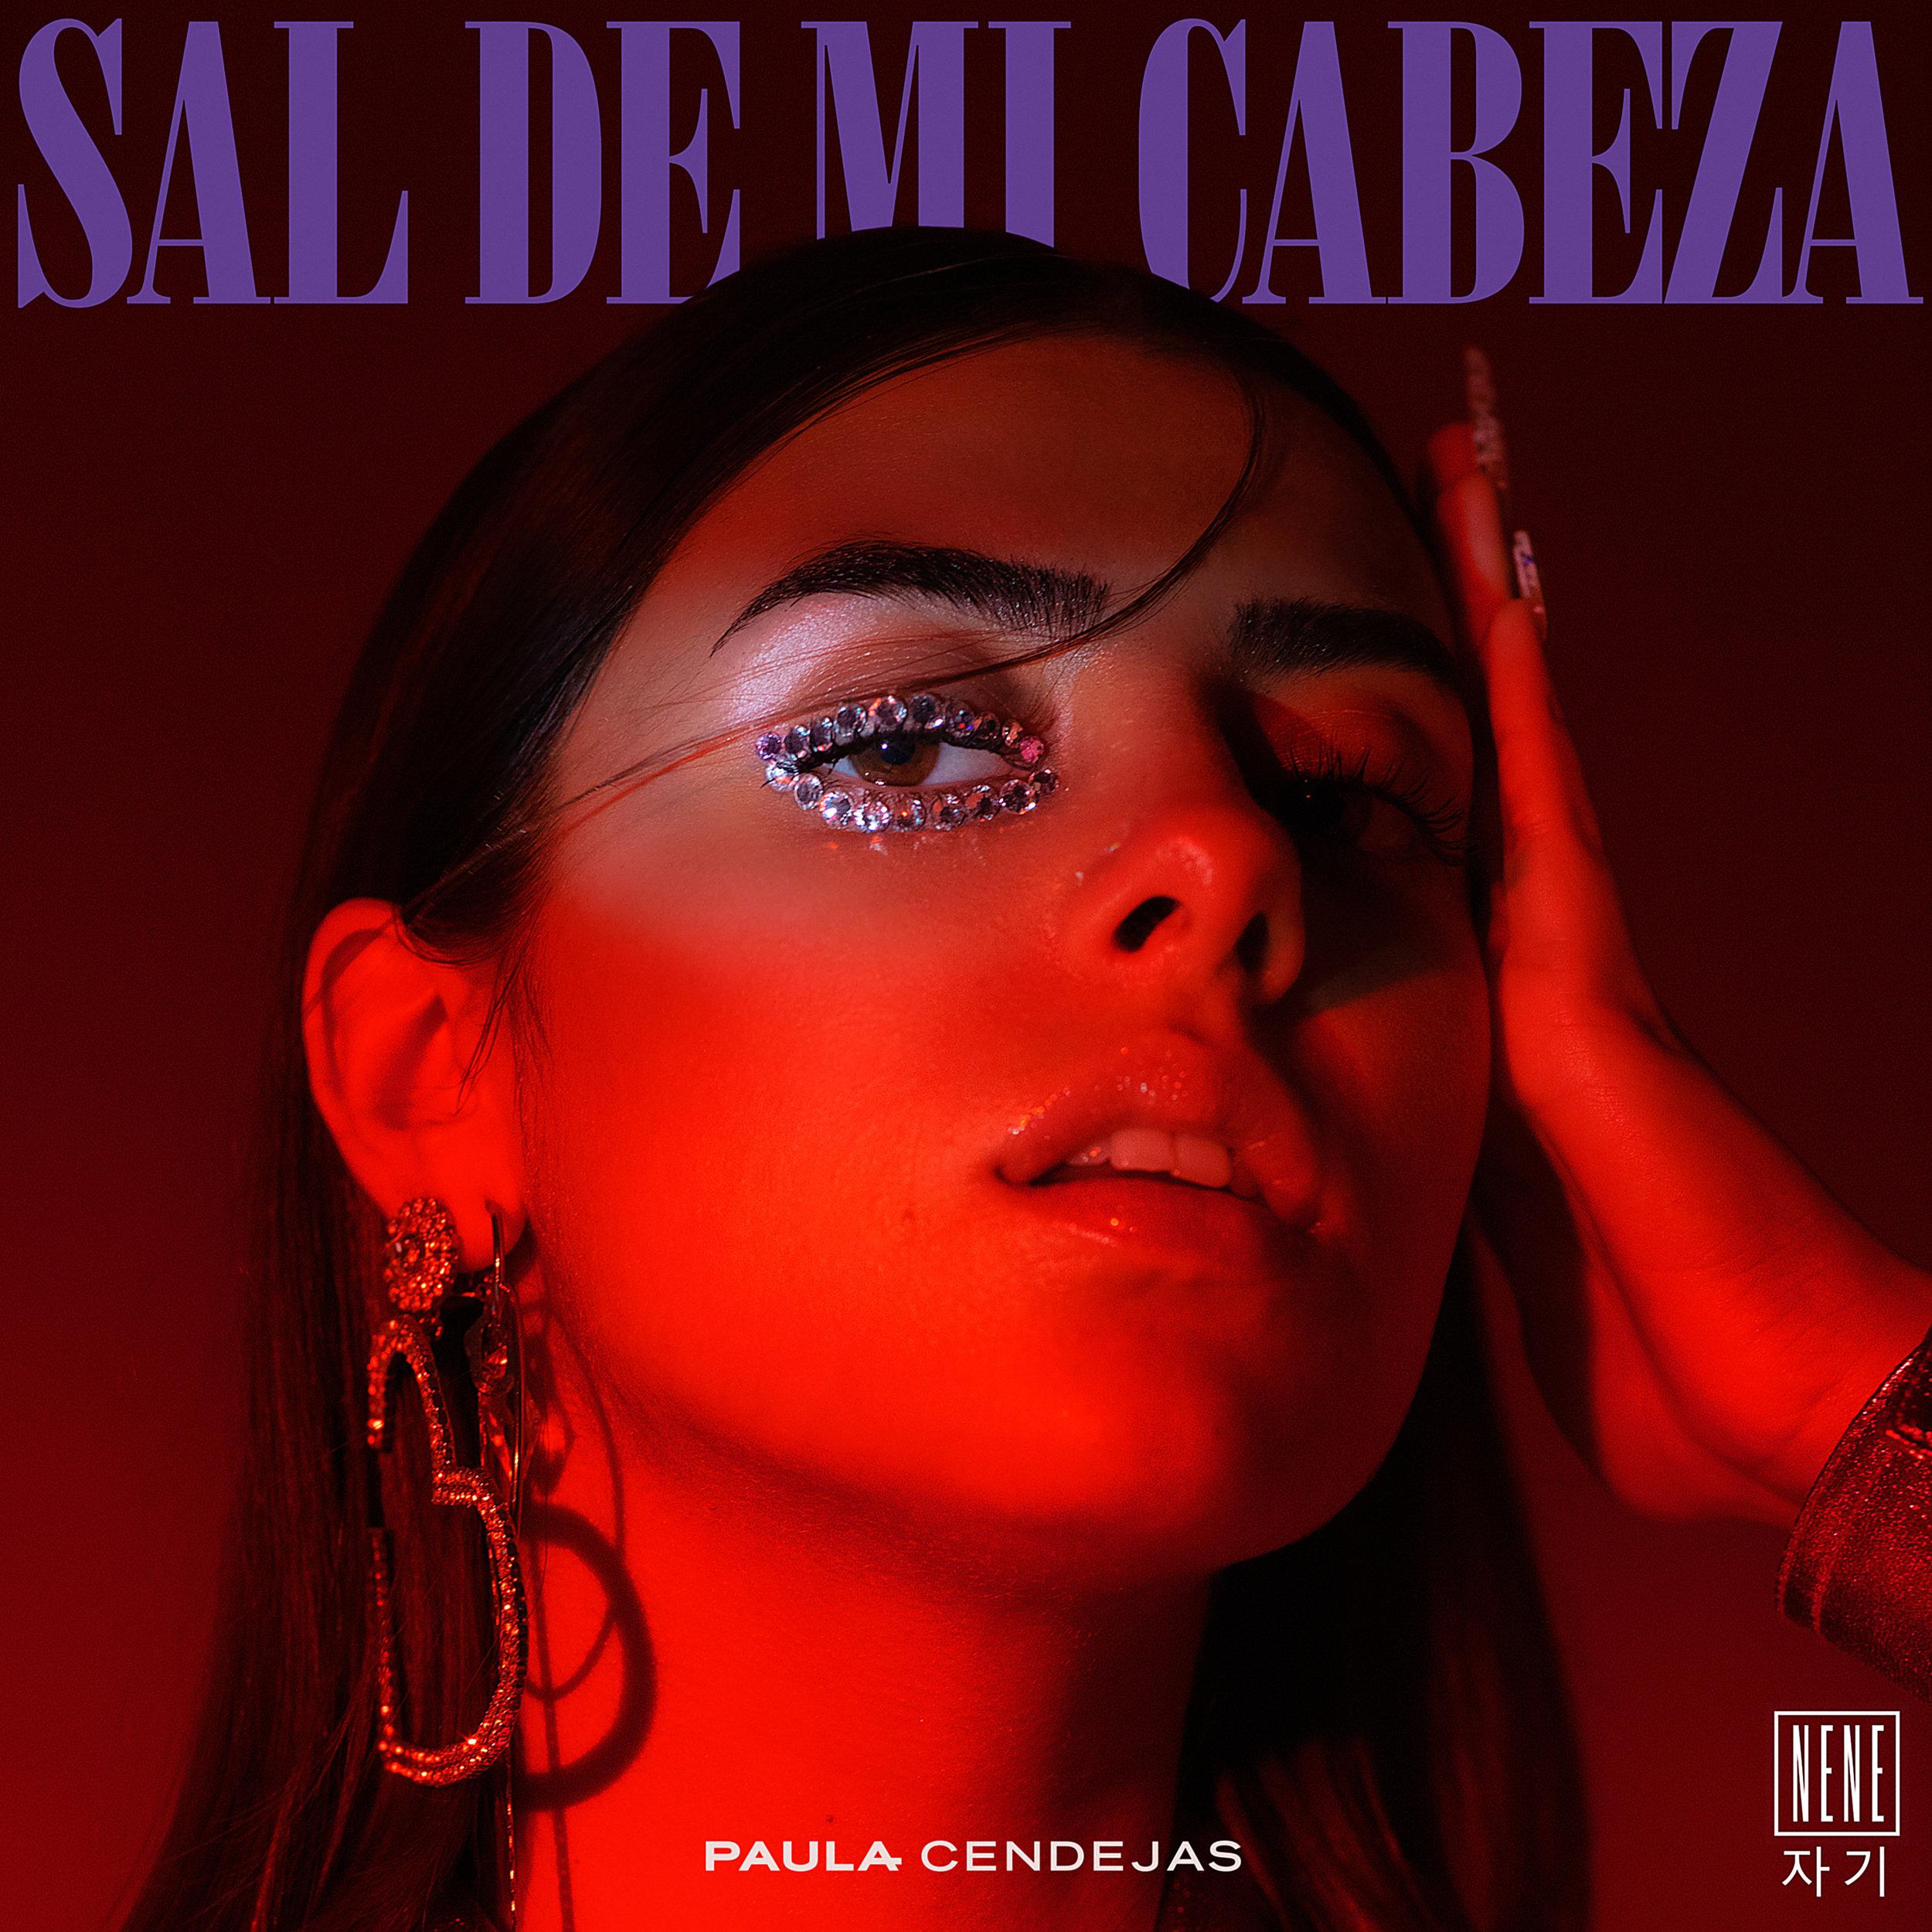 Paula Cendejas - Sal de mi Cabeza (Artwork).jpg